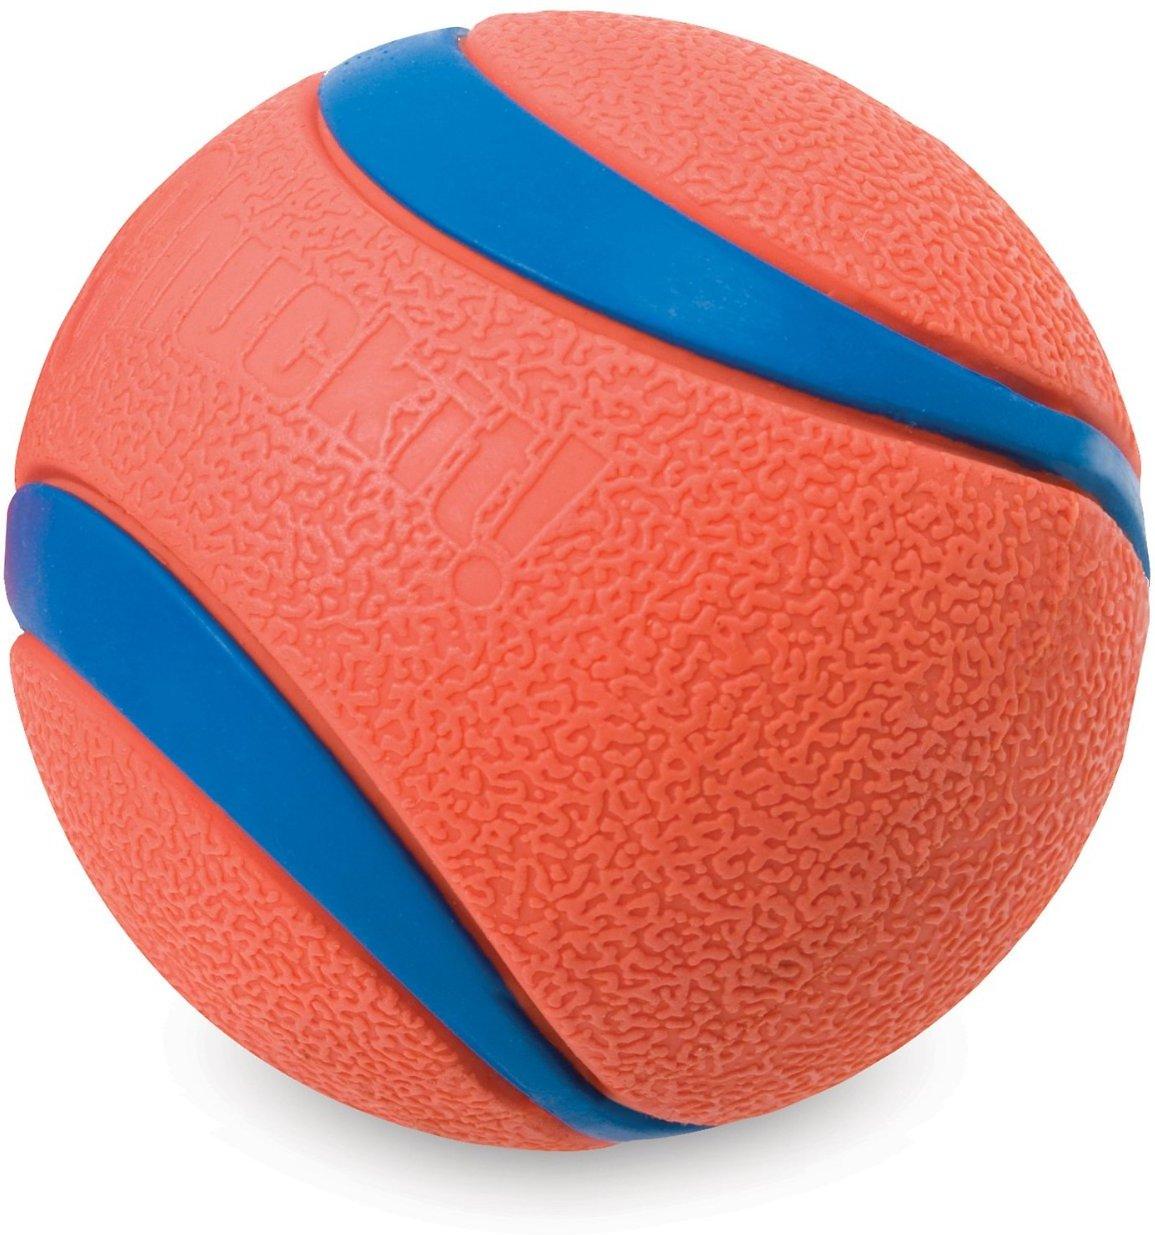 Chuckit ultra dog toy. Balls clipart rubber ball